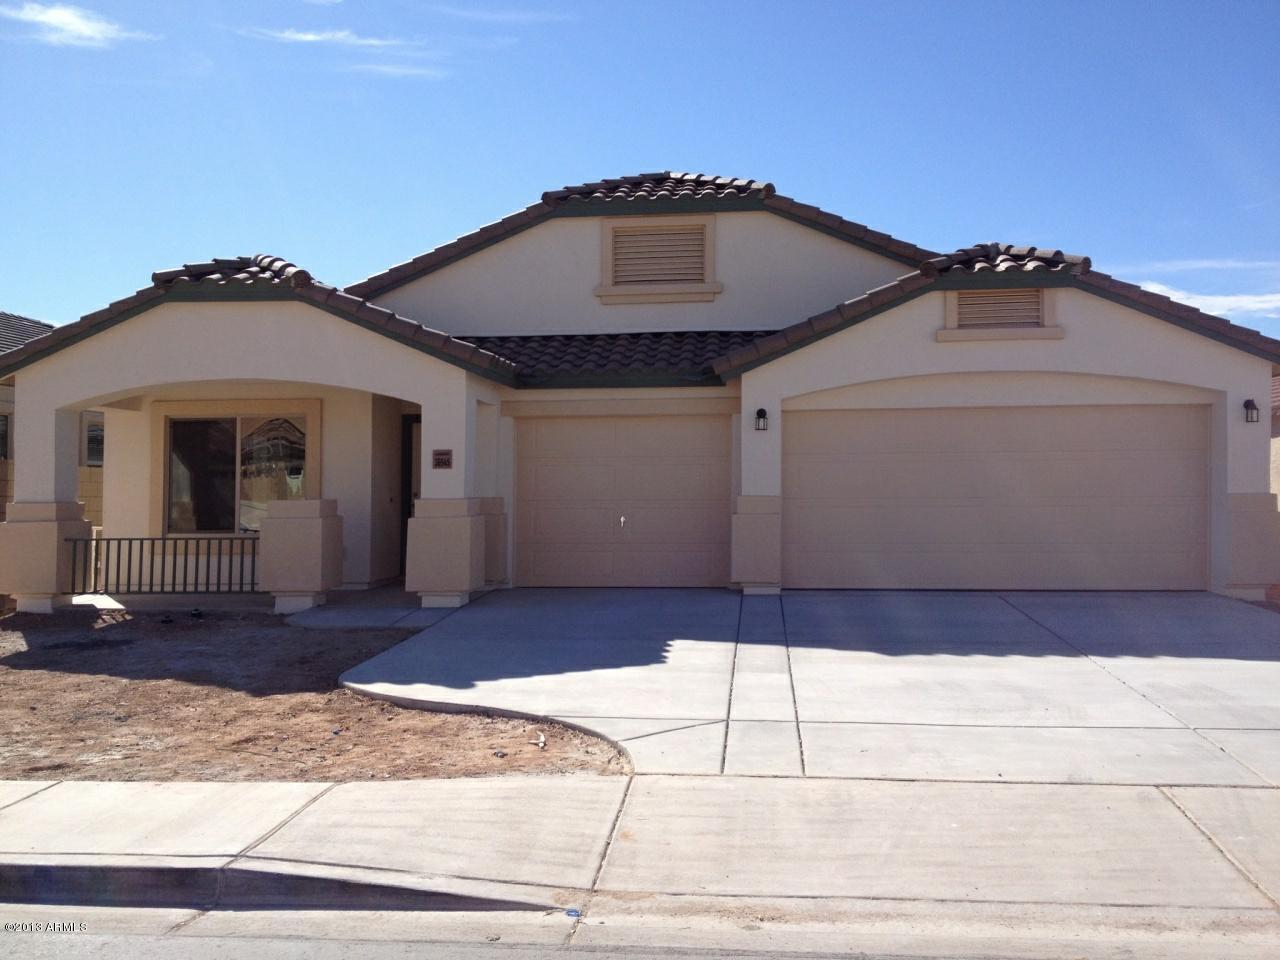 36945 W Leonessa Avenue, Maricopa, AZ 85138 (MLS #4816986) :: The Daniel Montez Real Estate Group